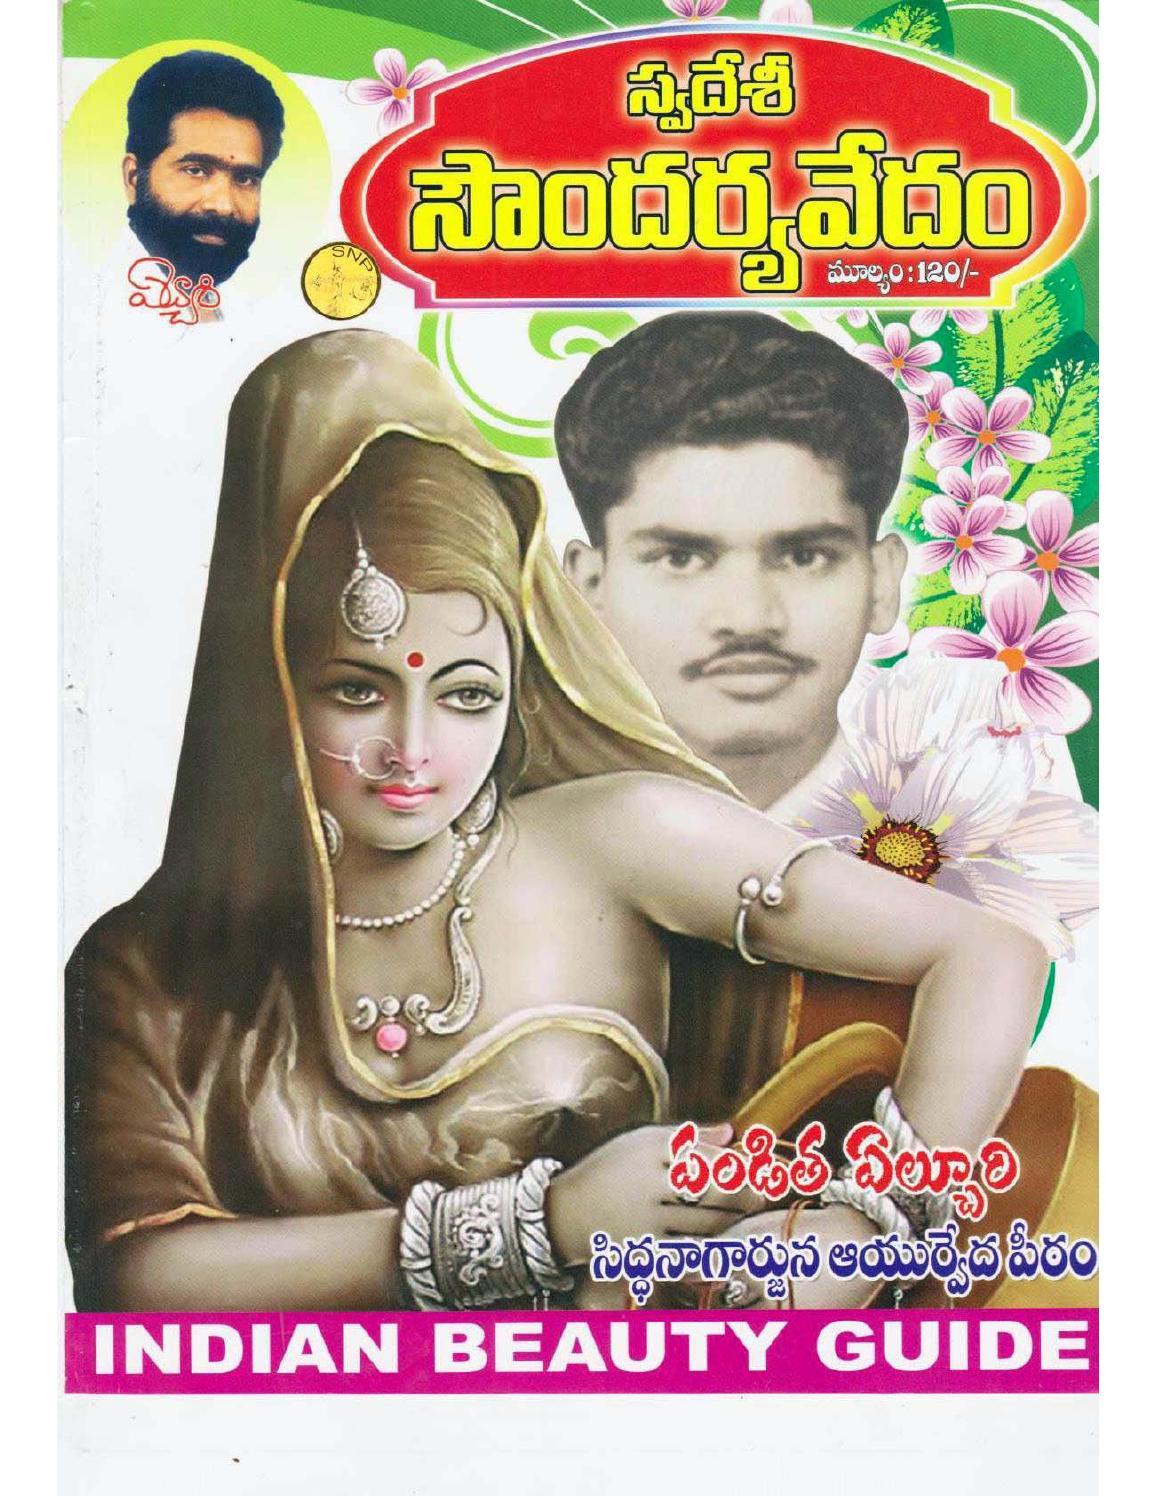 Arogyamrutham Telugu Ayurvedam Pdf Book - vinayvisions